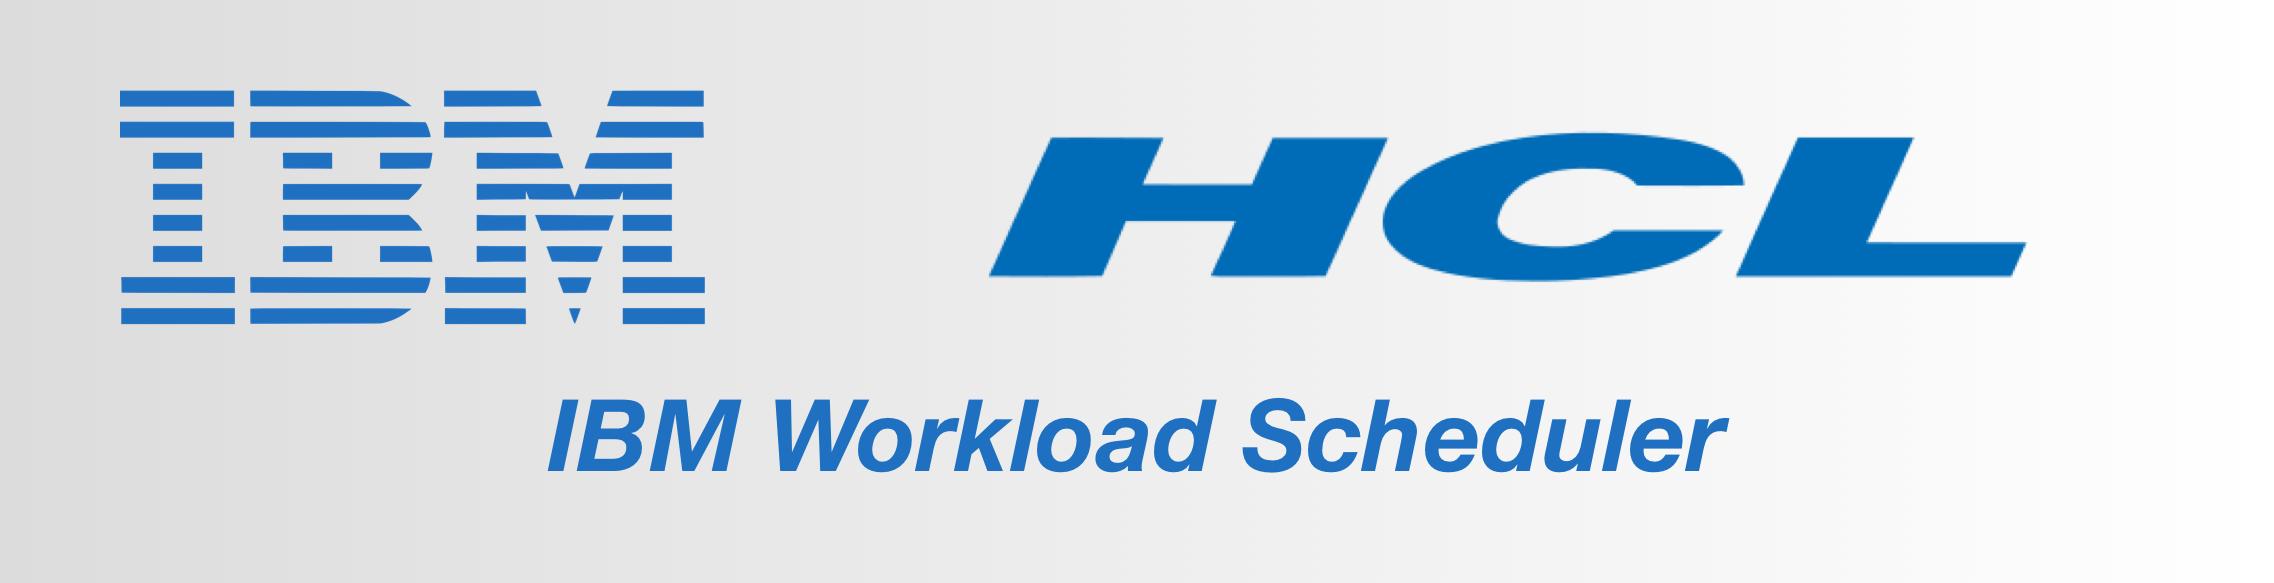 IBM & HCL Technologies